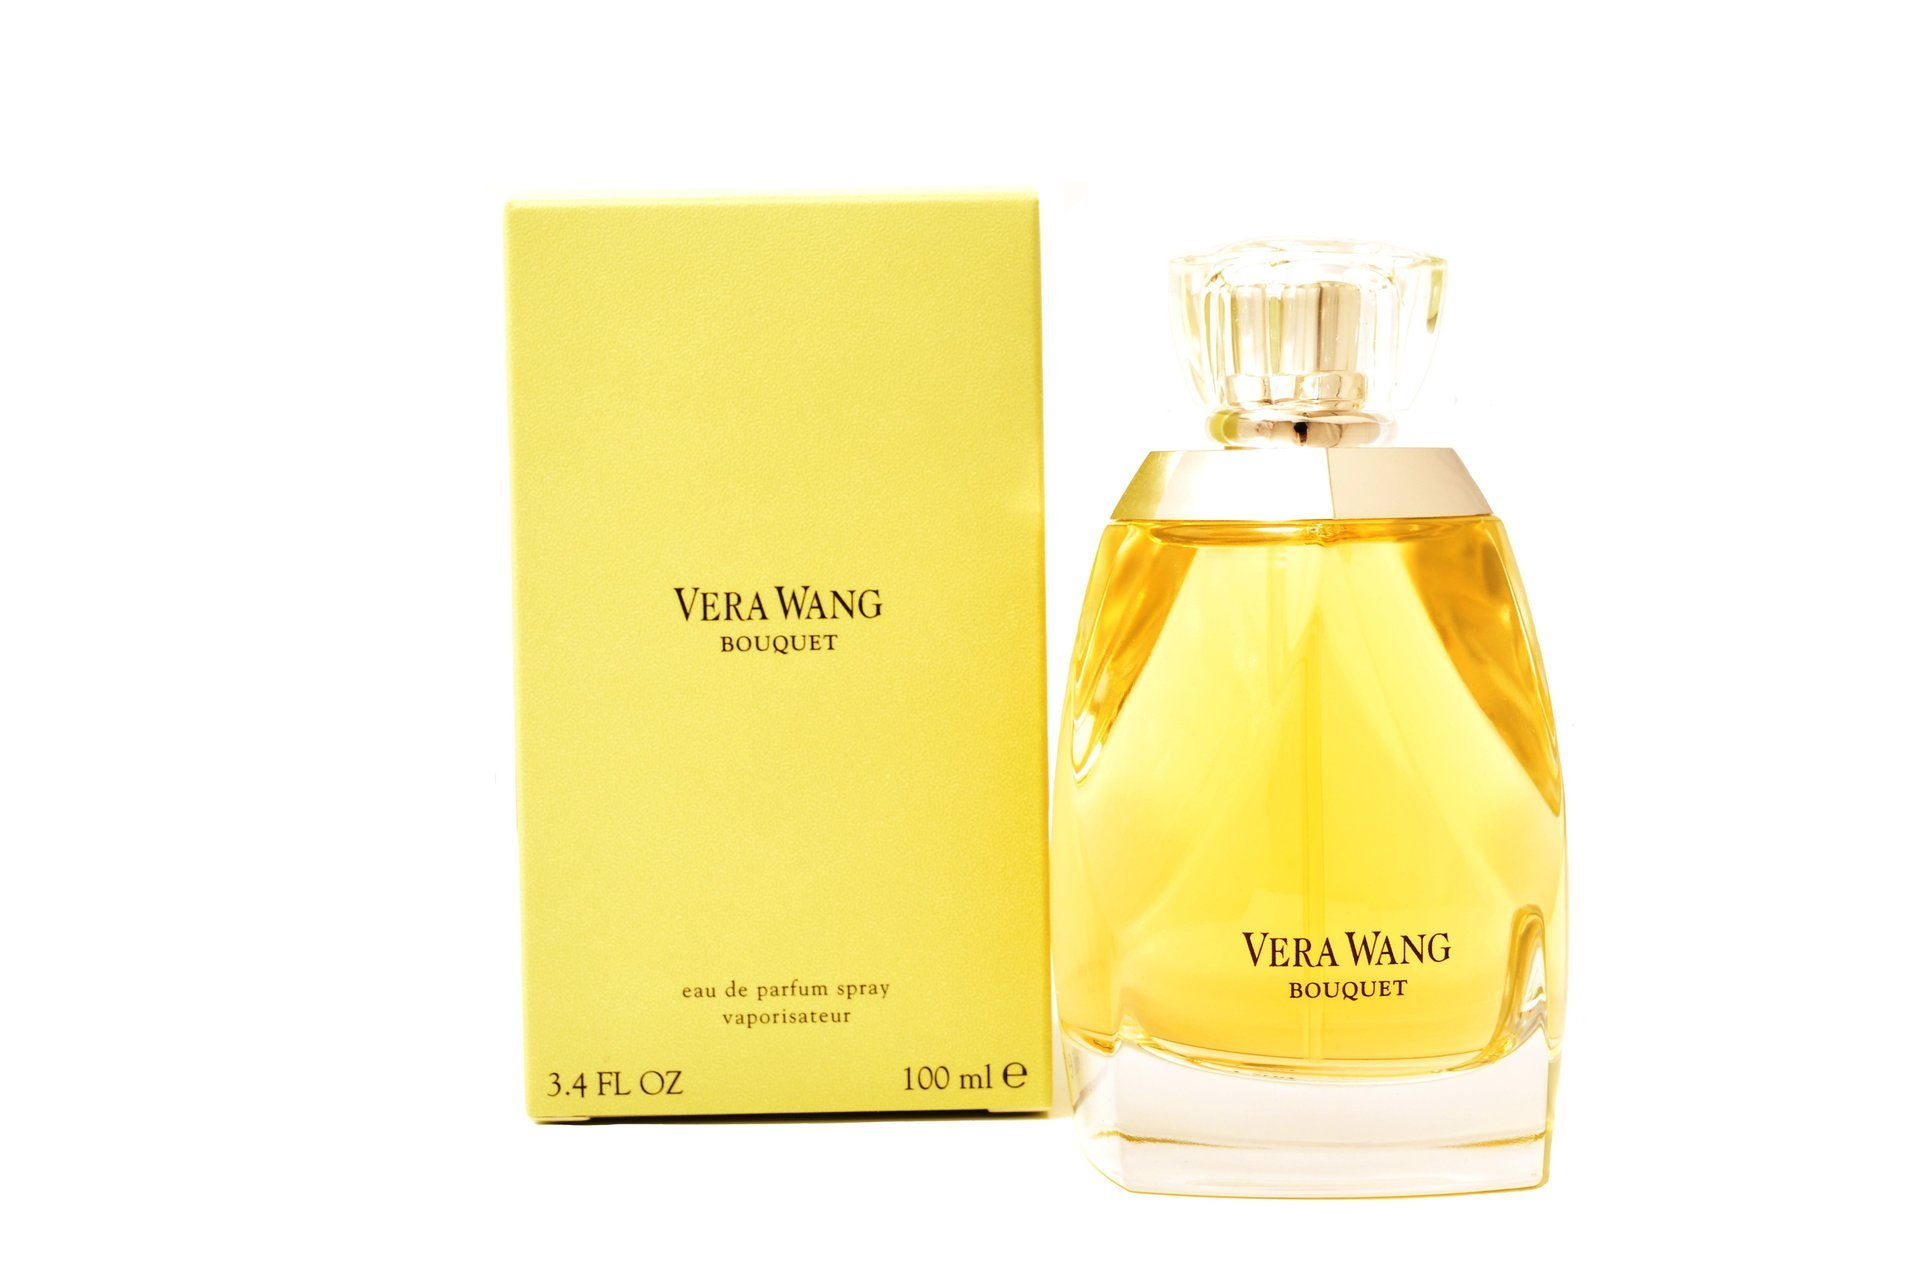 Vera Wang Bouquet 100ml Eau De Parfum